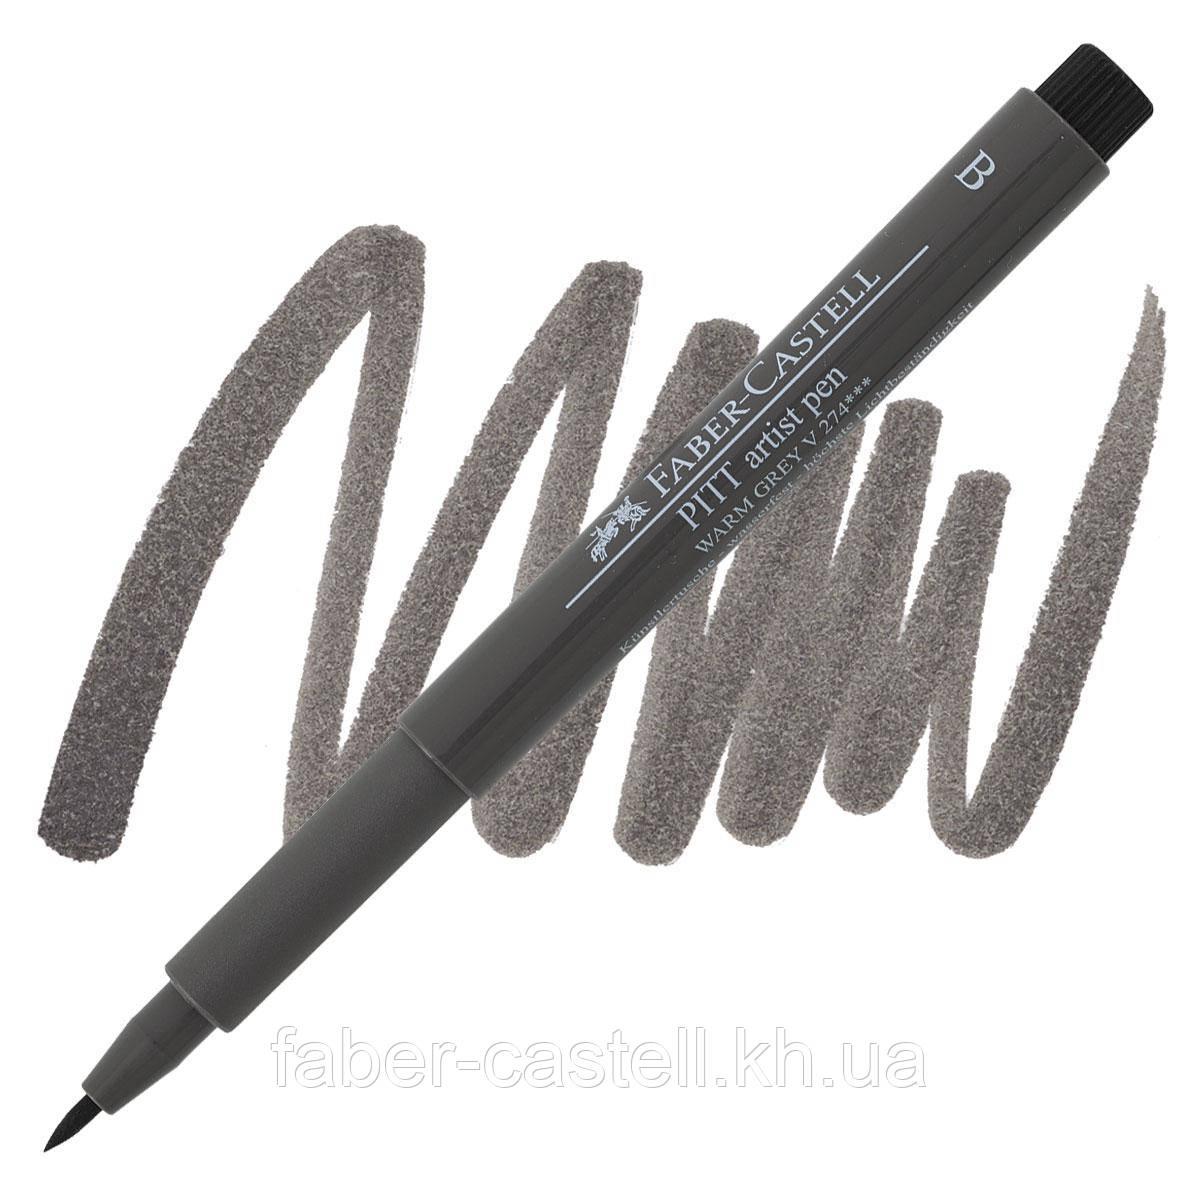 "Ручка-кисточка капиллярная Faber - Castell PITT® ARTIST PEN ""BRUSH"" № 274  теплый серый V, 167474"